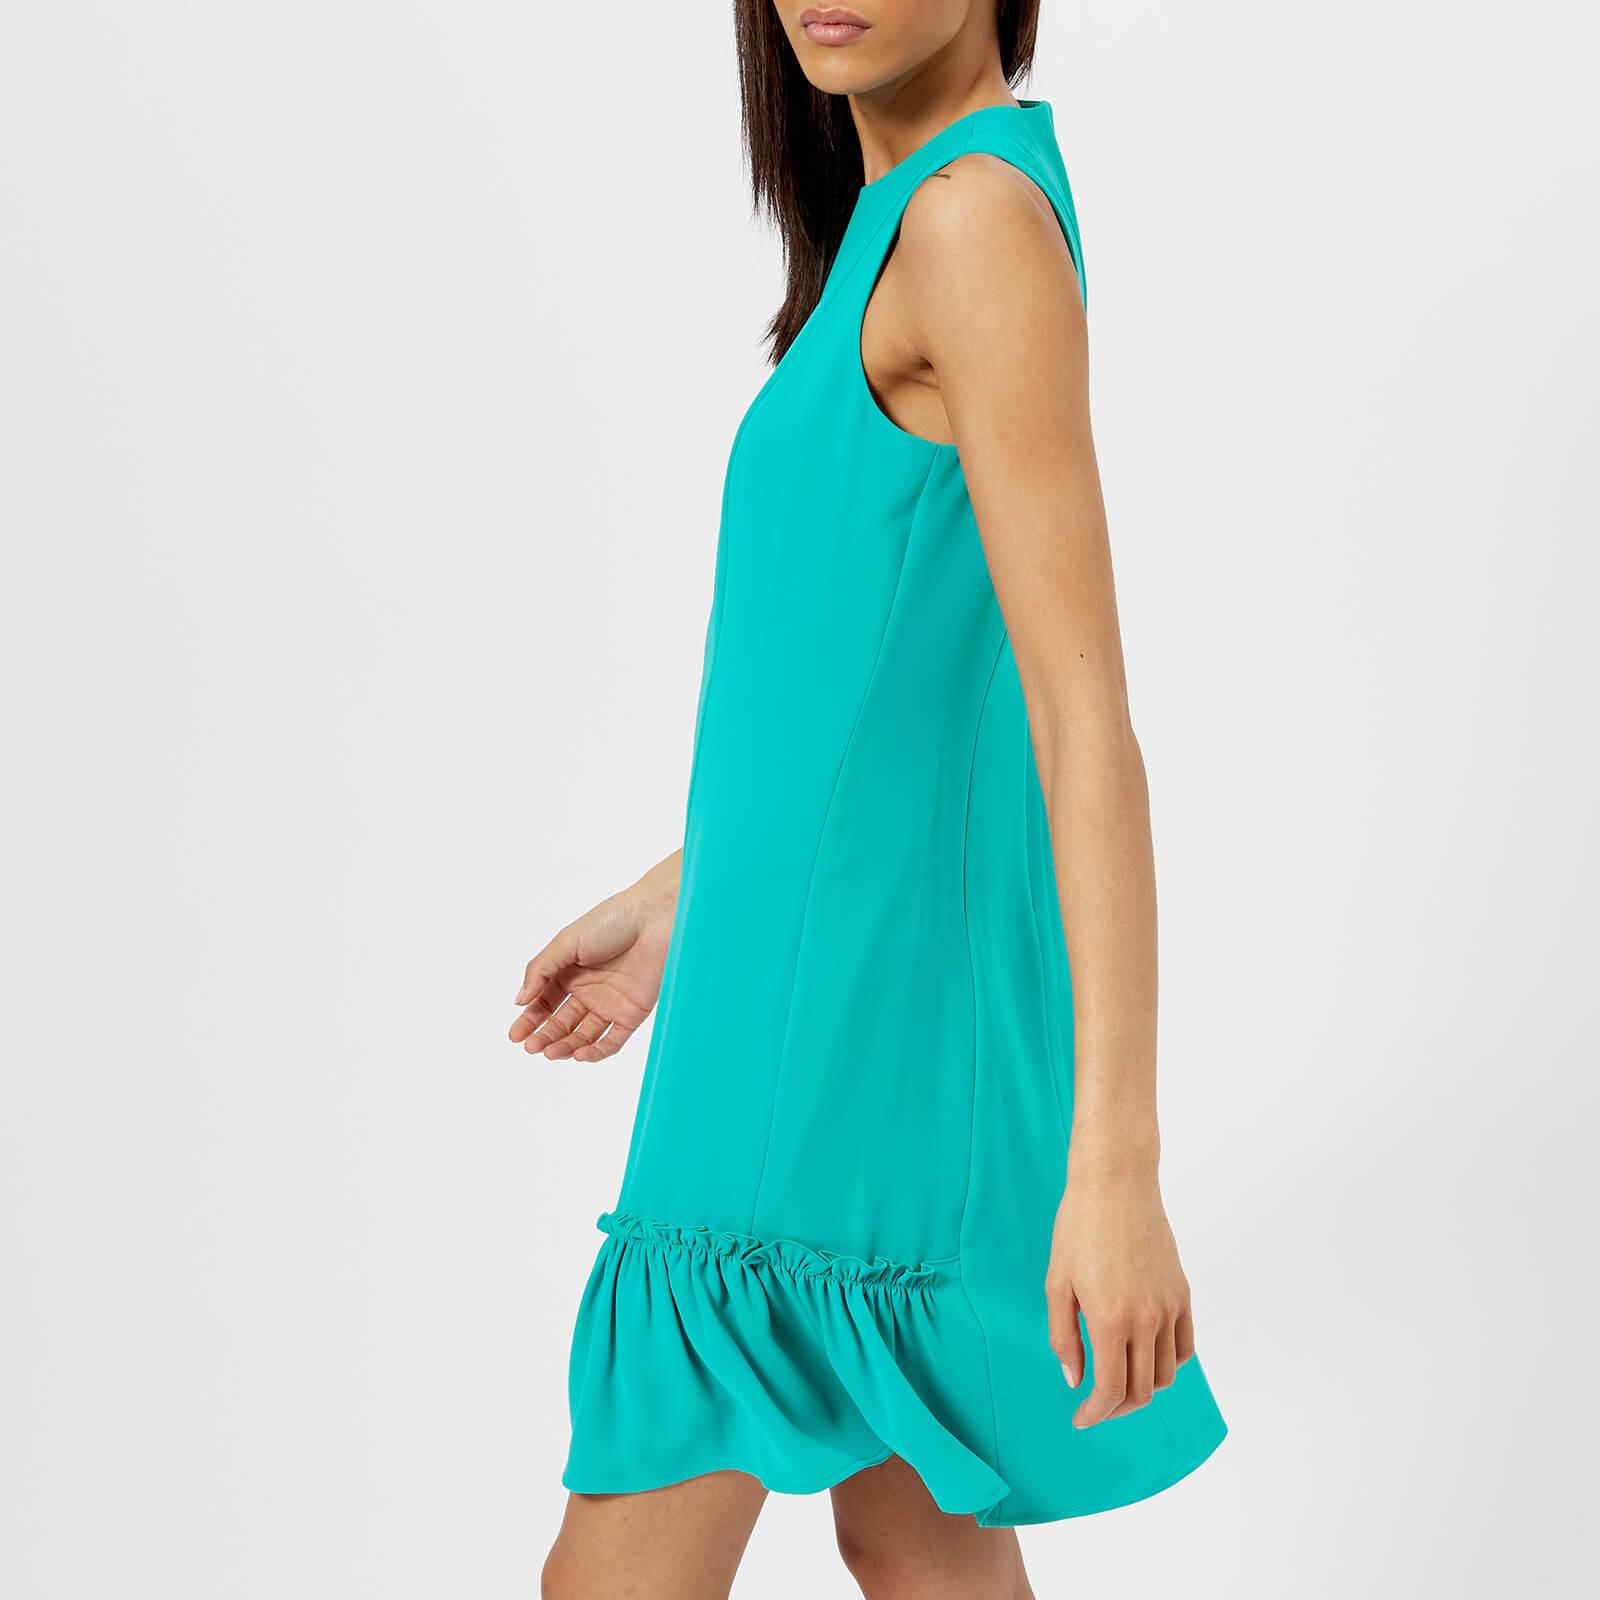 3f478ffe4c13 MICHAEL MICHAEL KORS Women s Sleeveless Ruffle Dress - Tile Blue ...